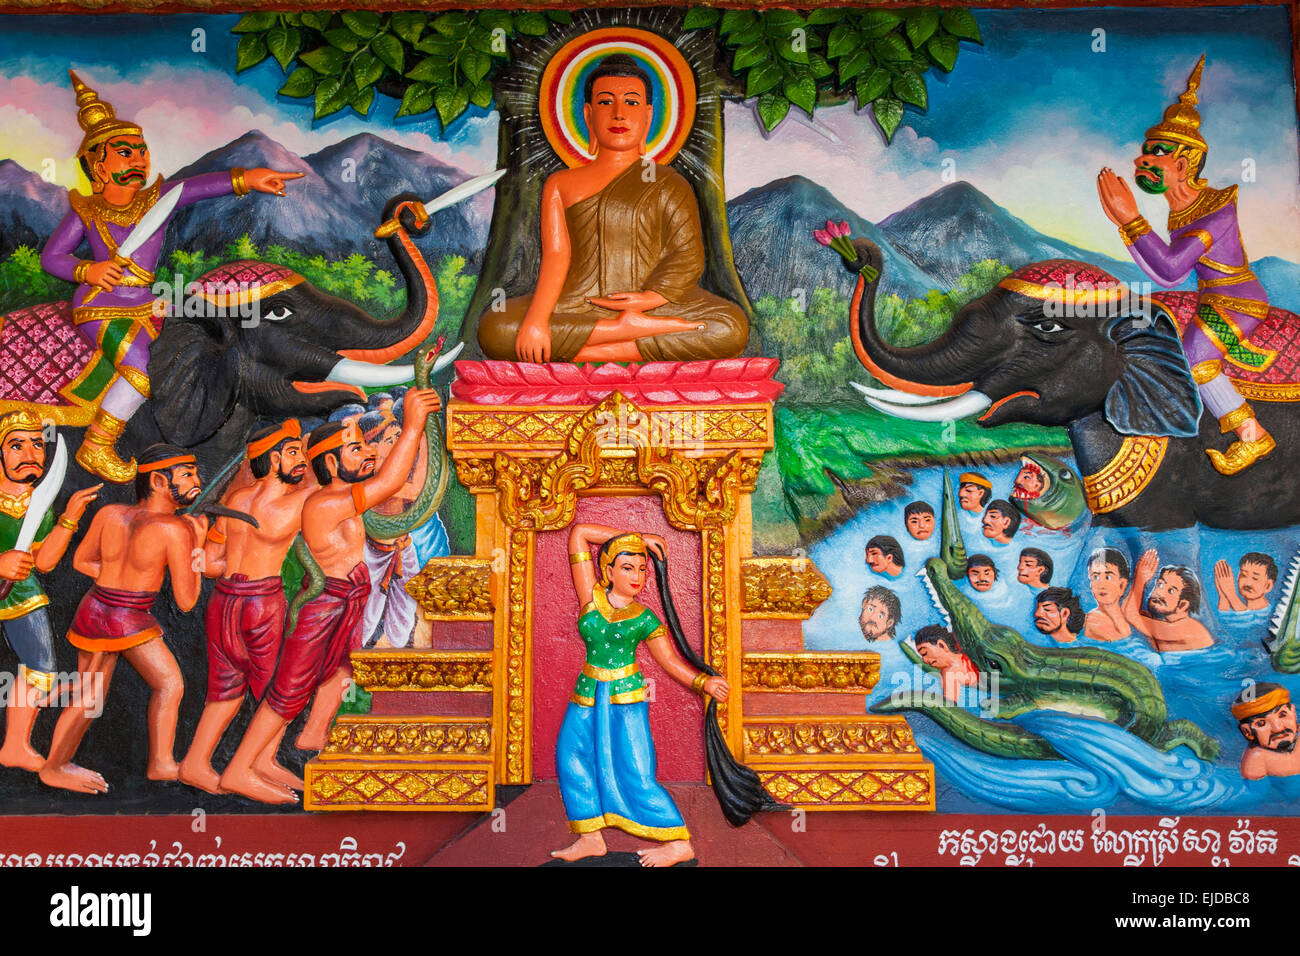 cambodia siem reap preah promreath temple wall mural painting cambodia siem reap preah promreath temple wall mural painting depicting the life of the buddha